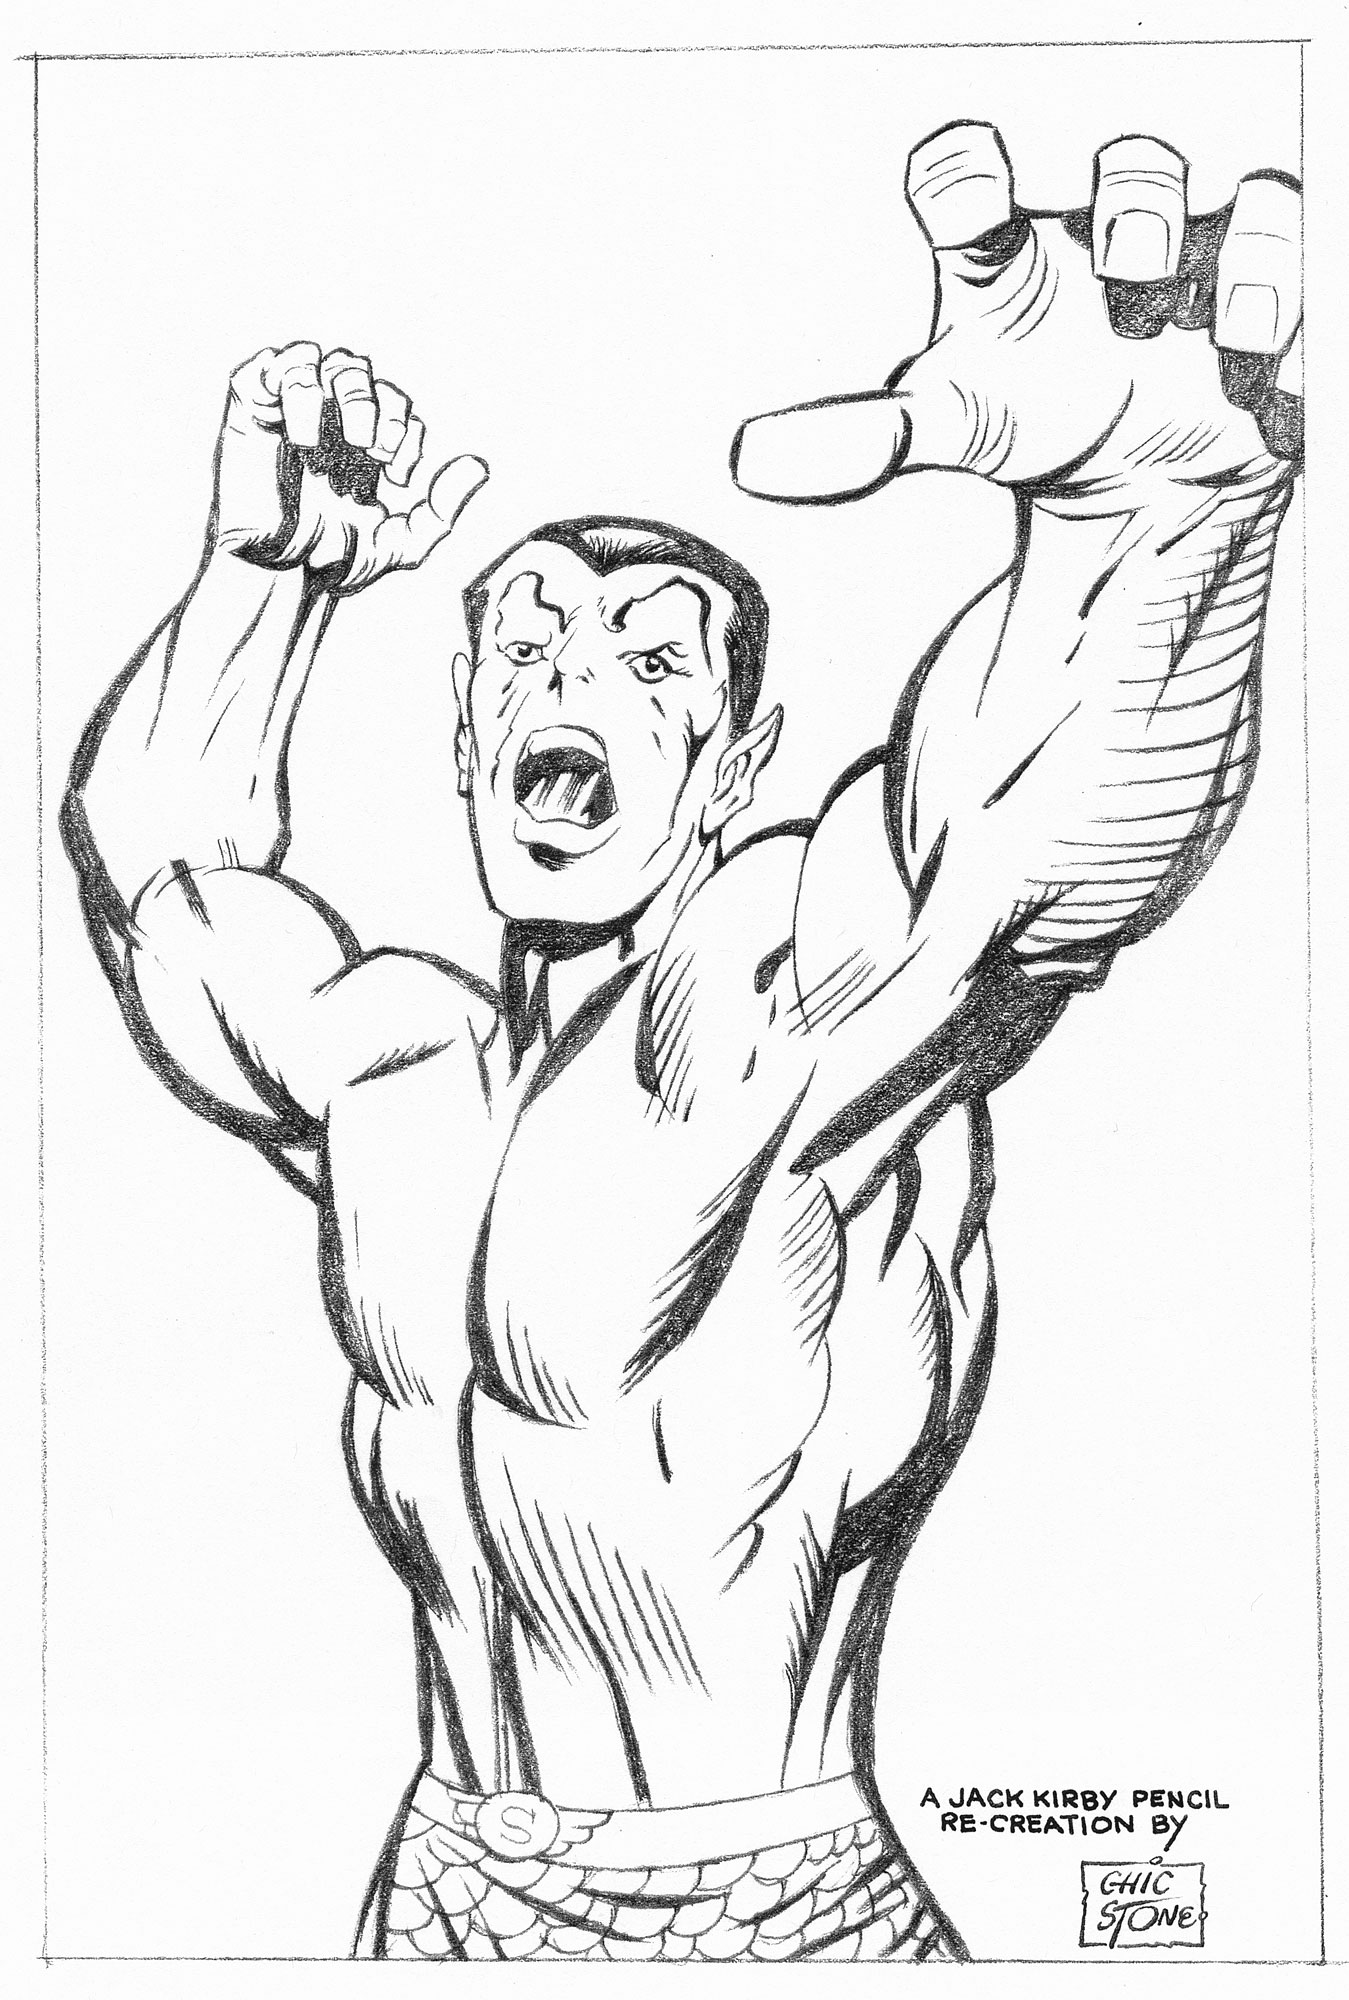 CHIC STONE SUB-MARINER PENCIL ART Comic Art